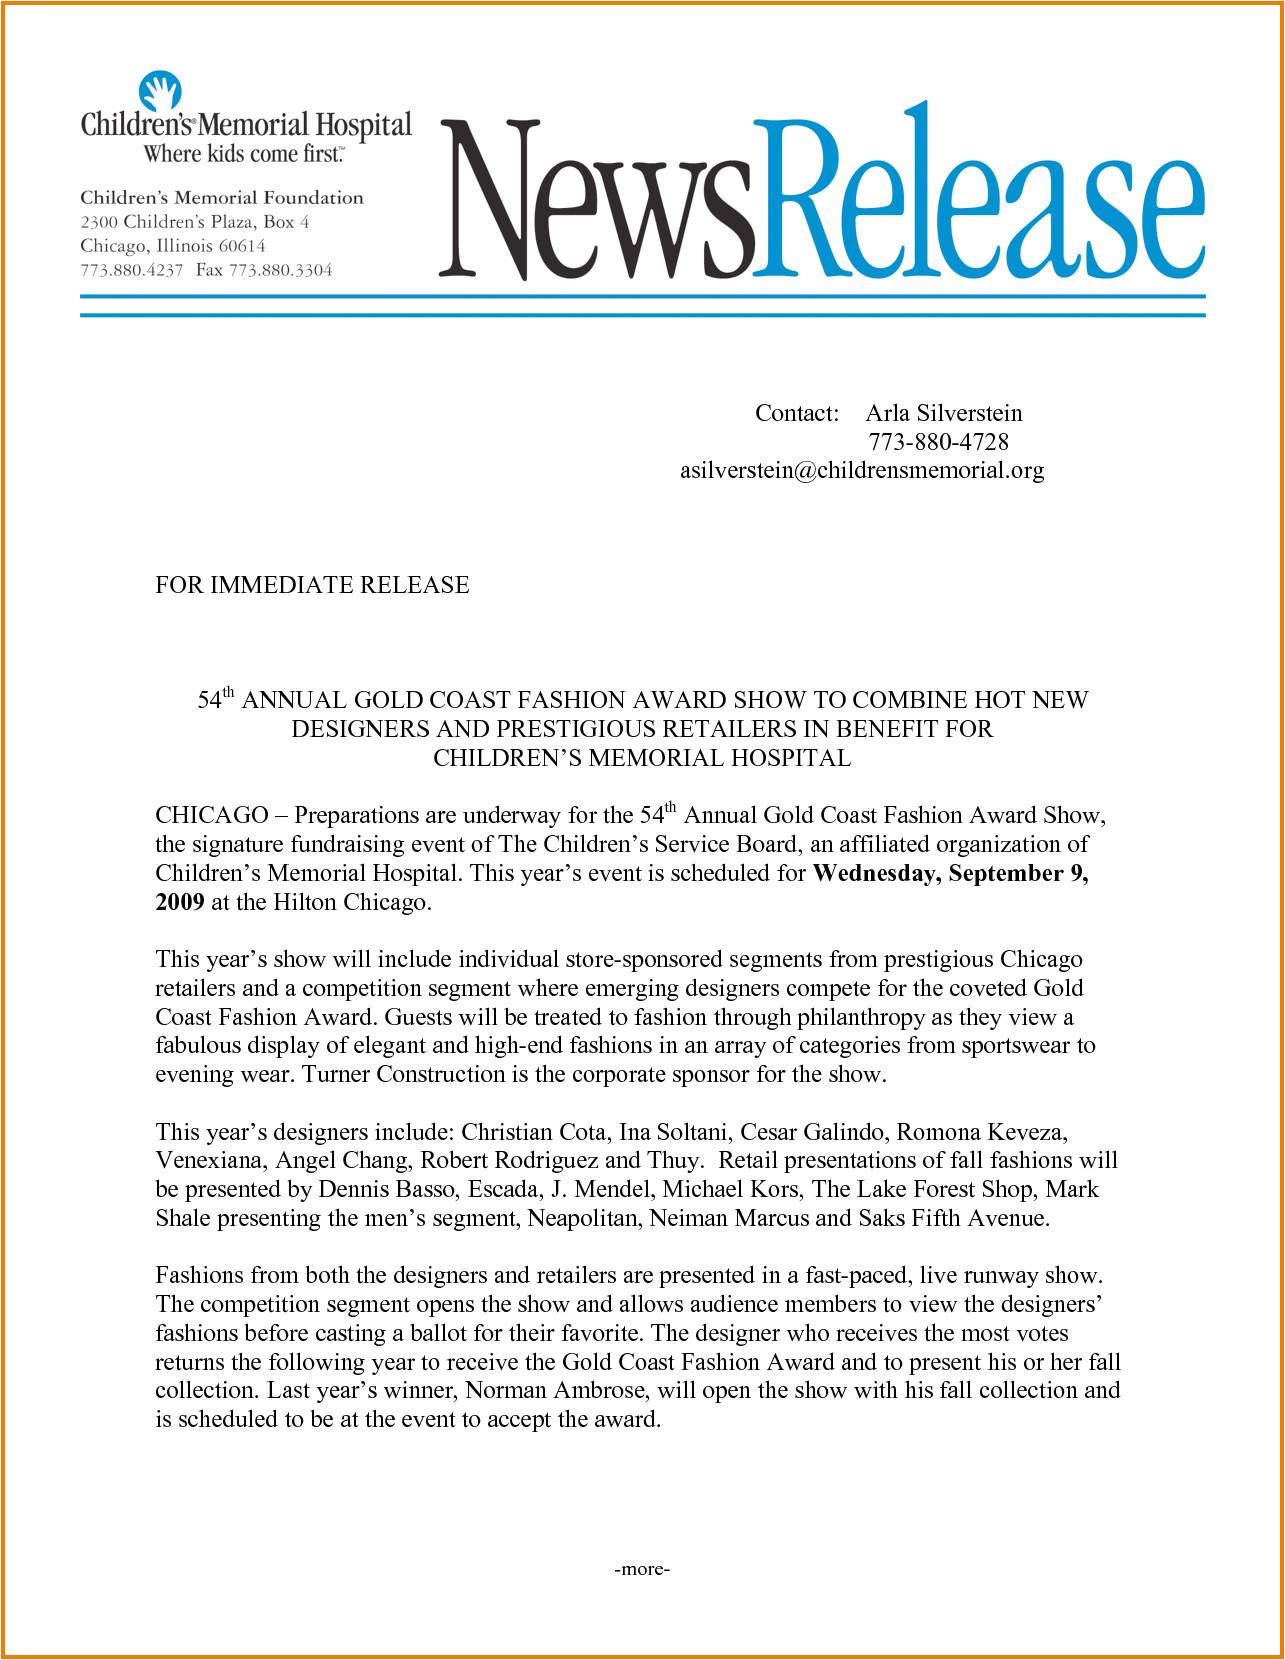 press release template 11213